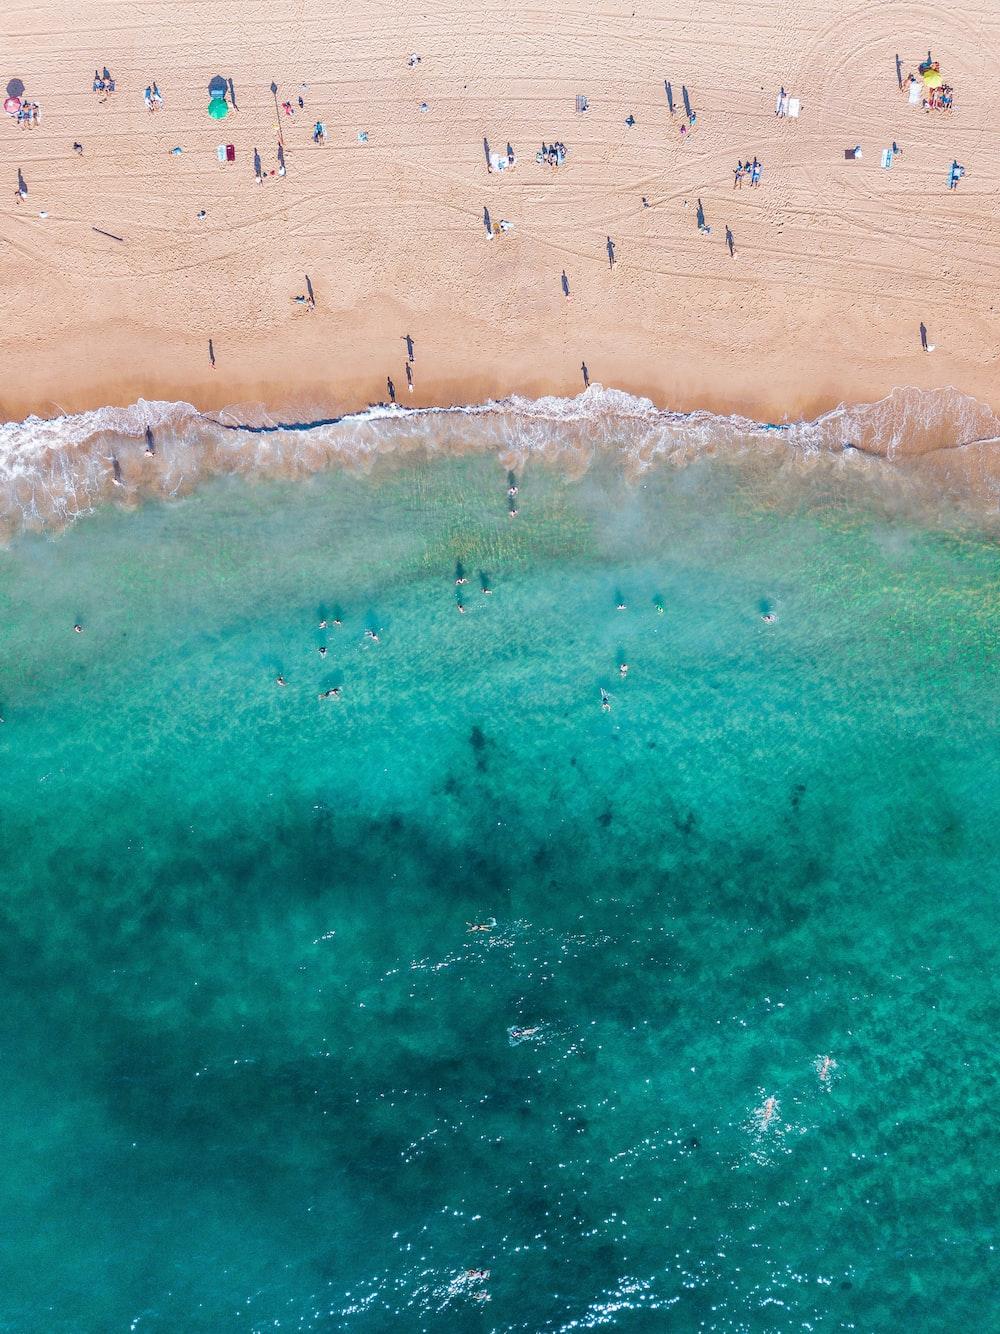 bird's eye view of shore